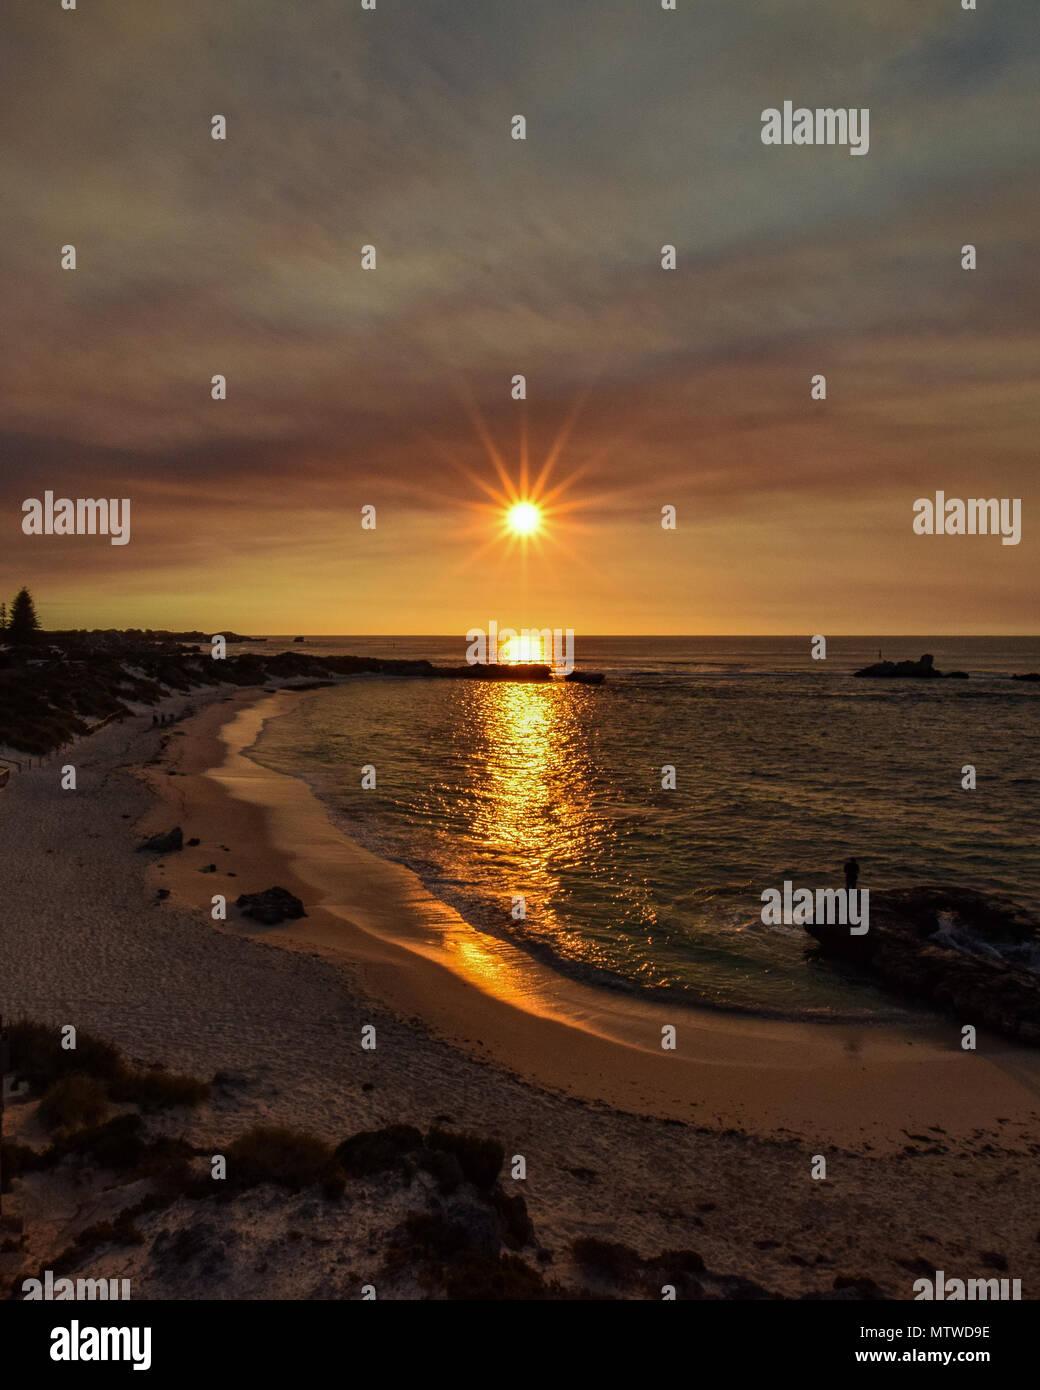 Sunset as seen at Bathurst Lighthouse, Rottnest Island, Western Australia - Stock Image